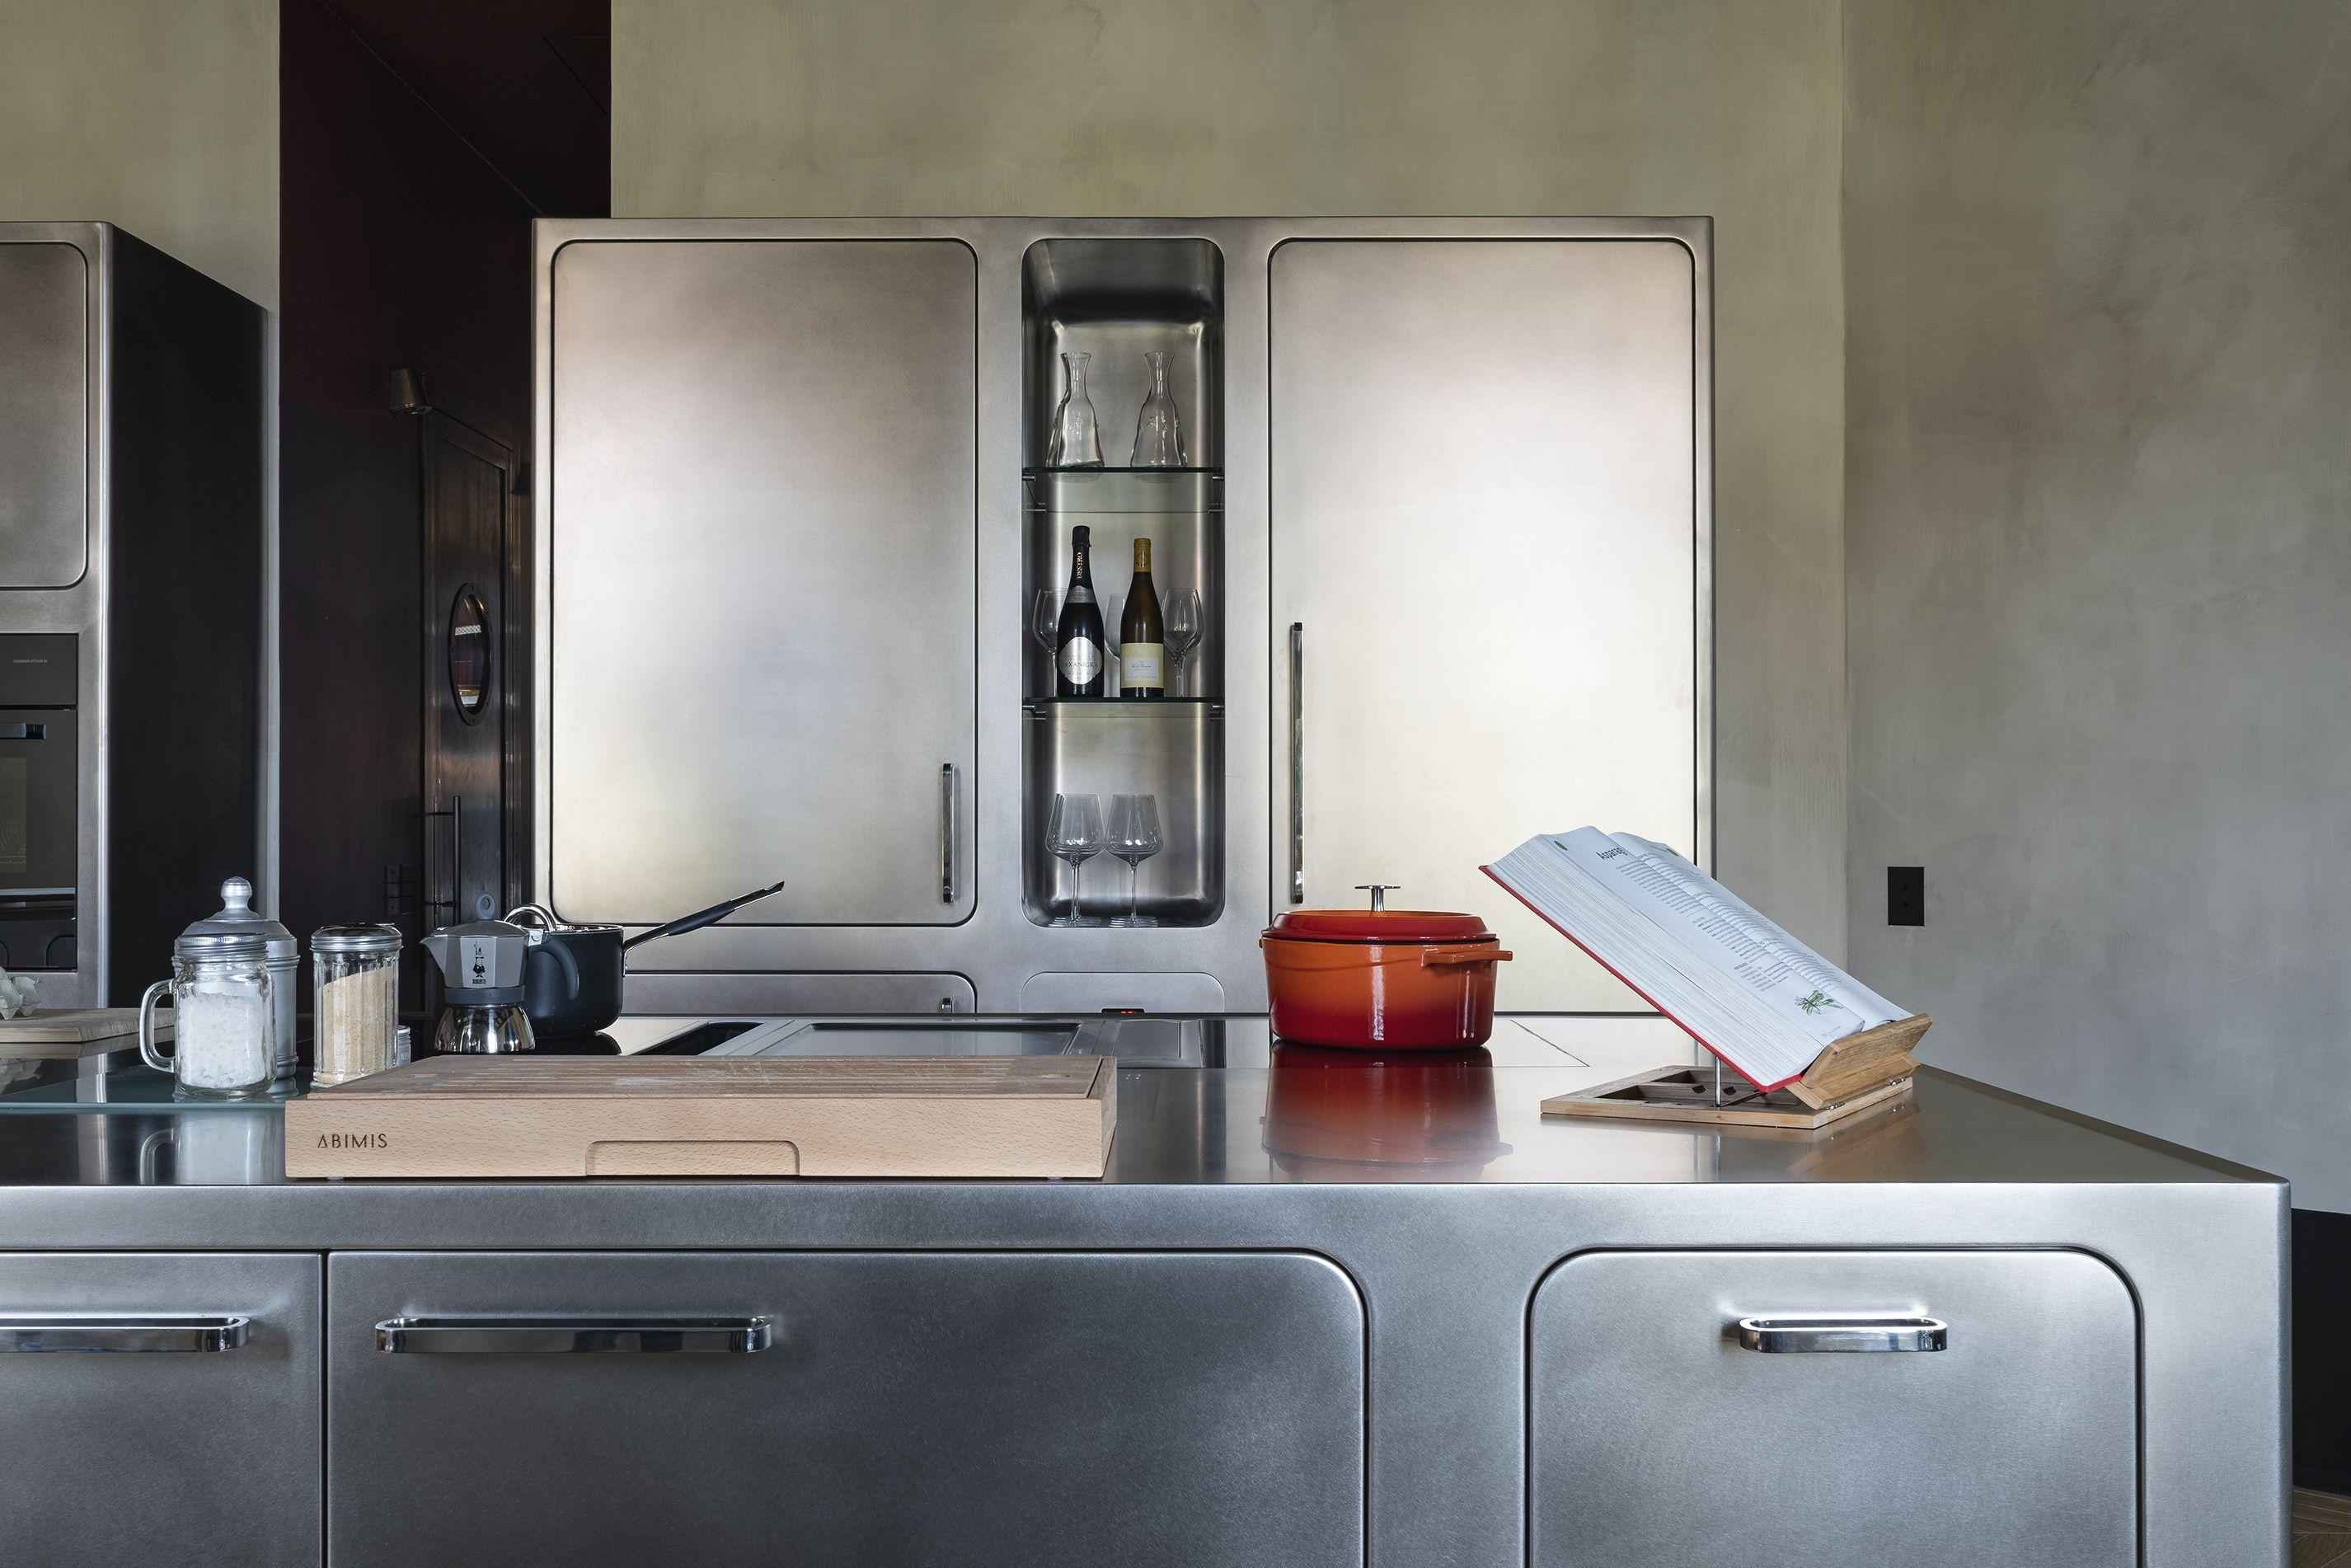 Stainless steel luxury Ego kitchen by Abimis.   modern industrial decor kitchen stainless steel #Abimis #StainlessKitchen #DesignKitchen #Design #Architecture #ArchiLovers #LoveDesign #Projects #ArchiProjects #Steel #Stainless #ModernKitchen #IndustrialStyle #IndustrialChic #Luxury #LuxuryKitchen #LuxuryHome #Cucine #CucineDiDesign #CucineInAcciaio #AcciaioInox